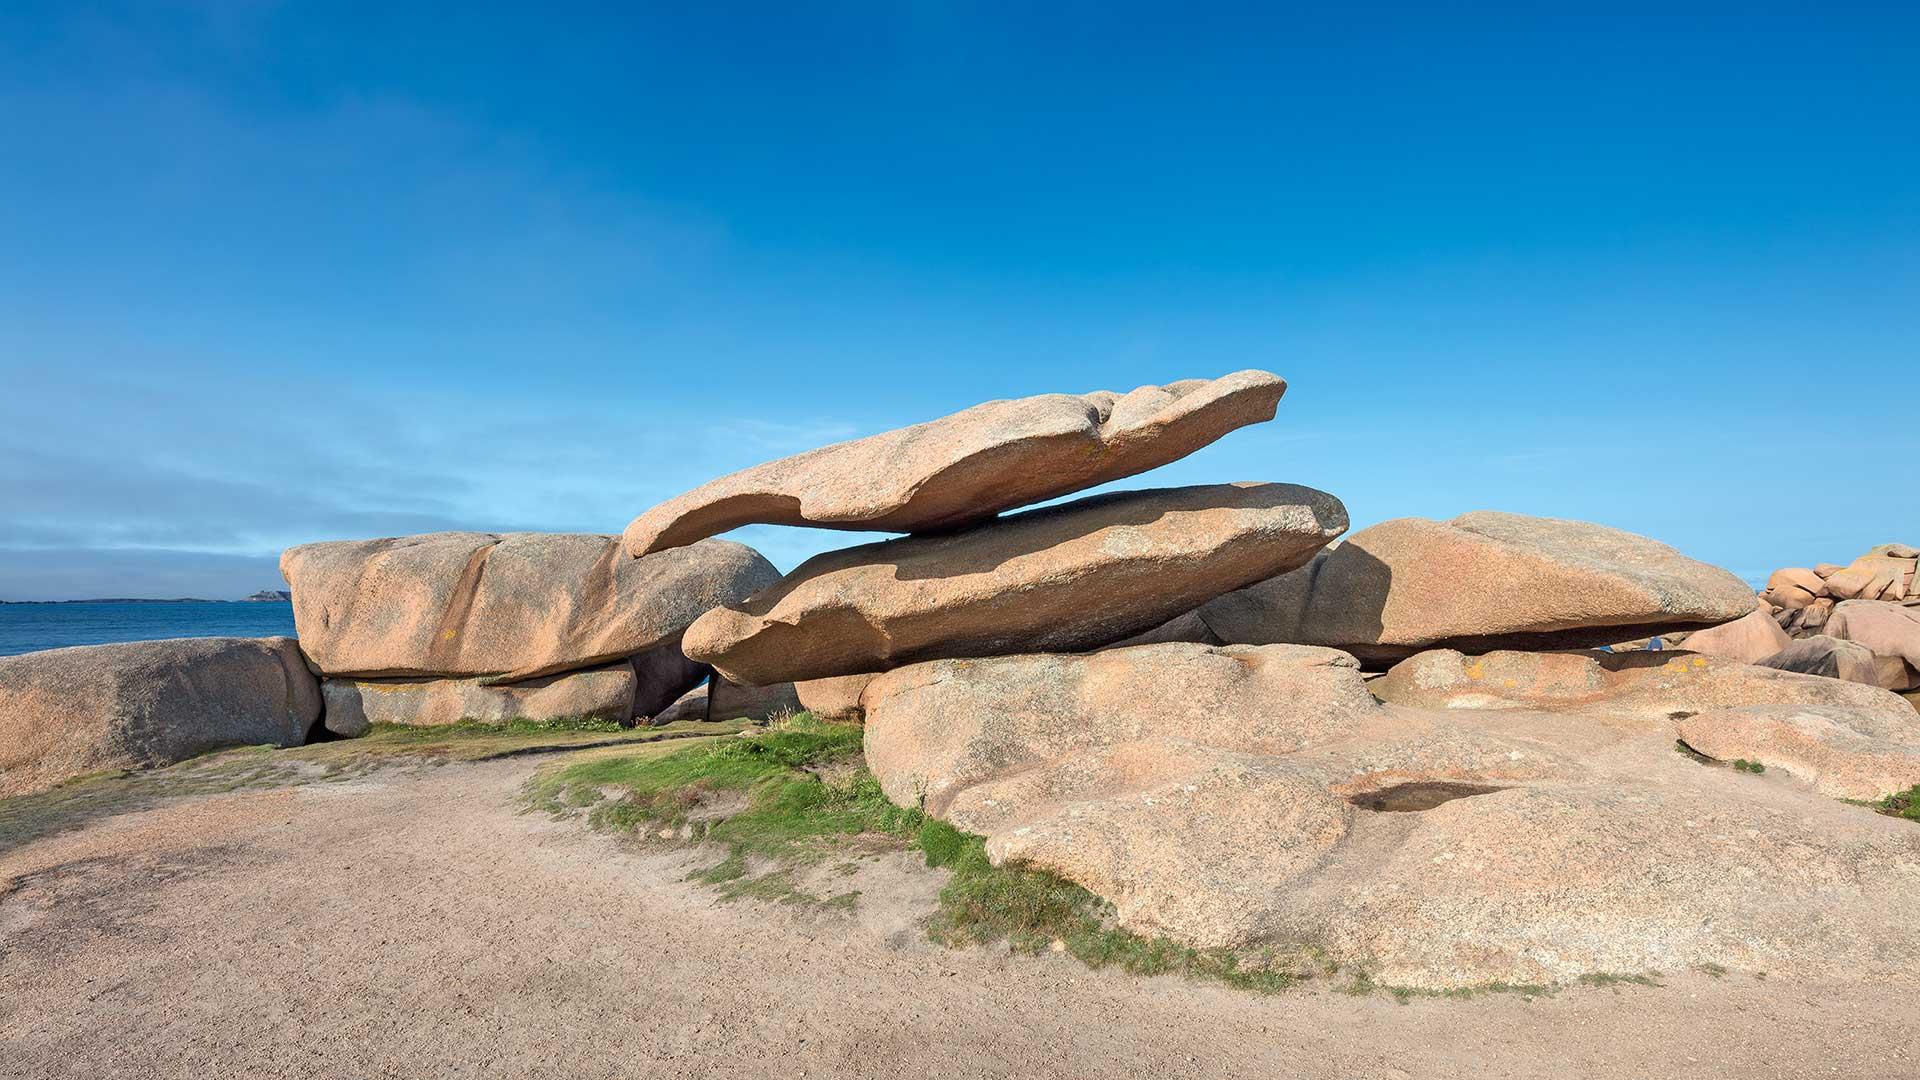 Landschaftsfotografie: Côte de Granit Rose – Fels-Balance auf der Halbinsel Renote | Foto: Dieter Eikenberg, imprints